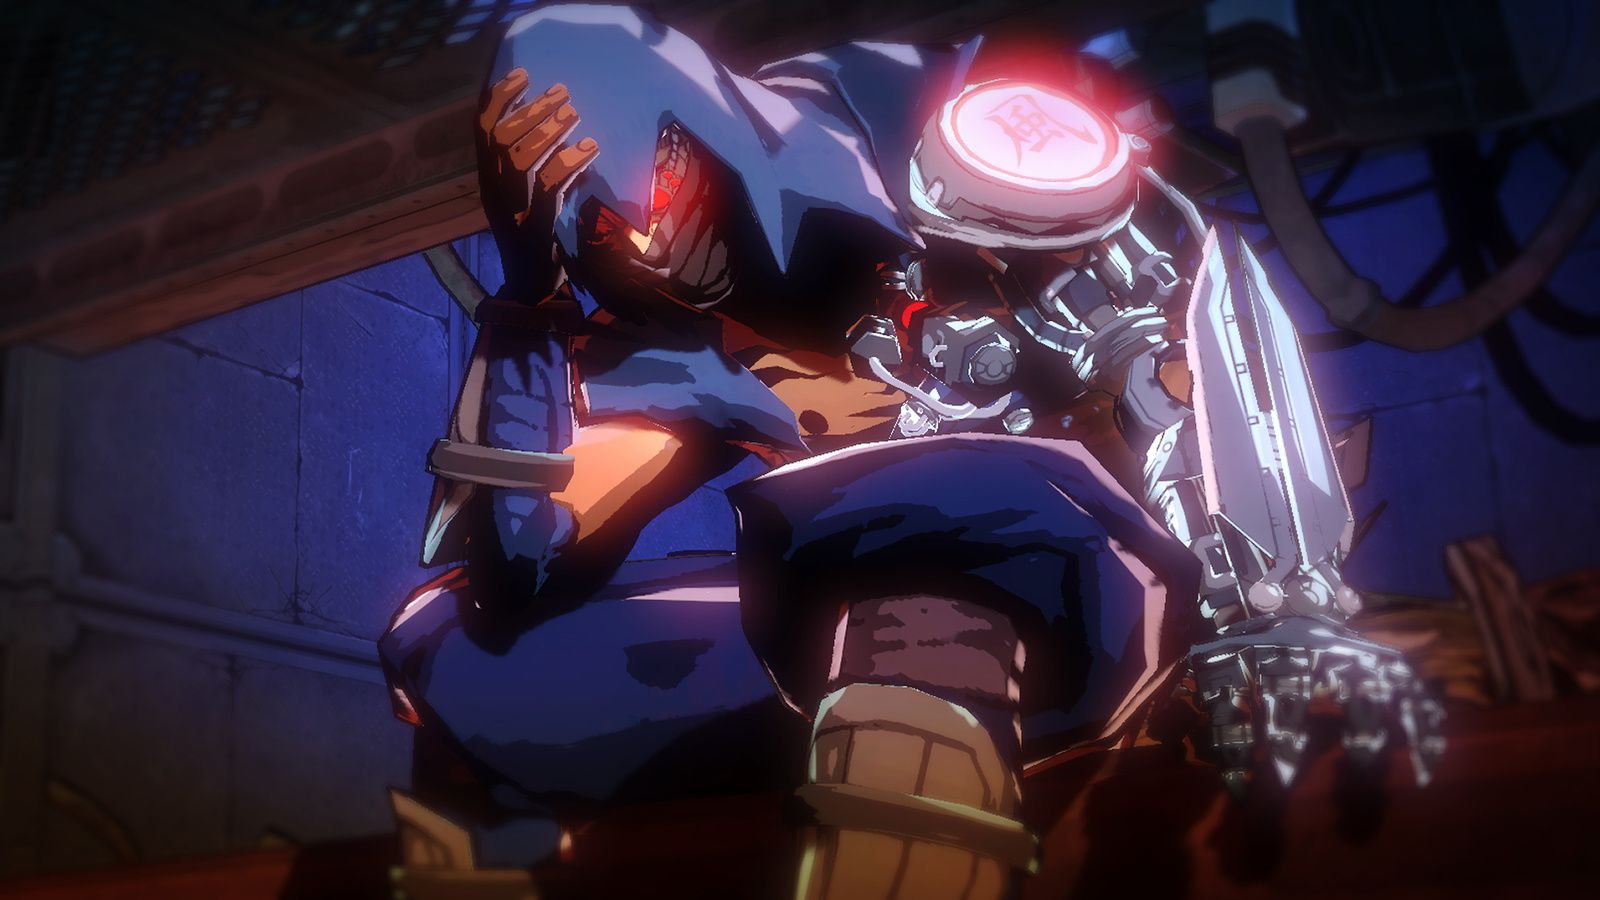 [CRITIQUE/TEST] Yaiba : Ninja Gaiden Z